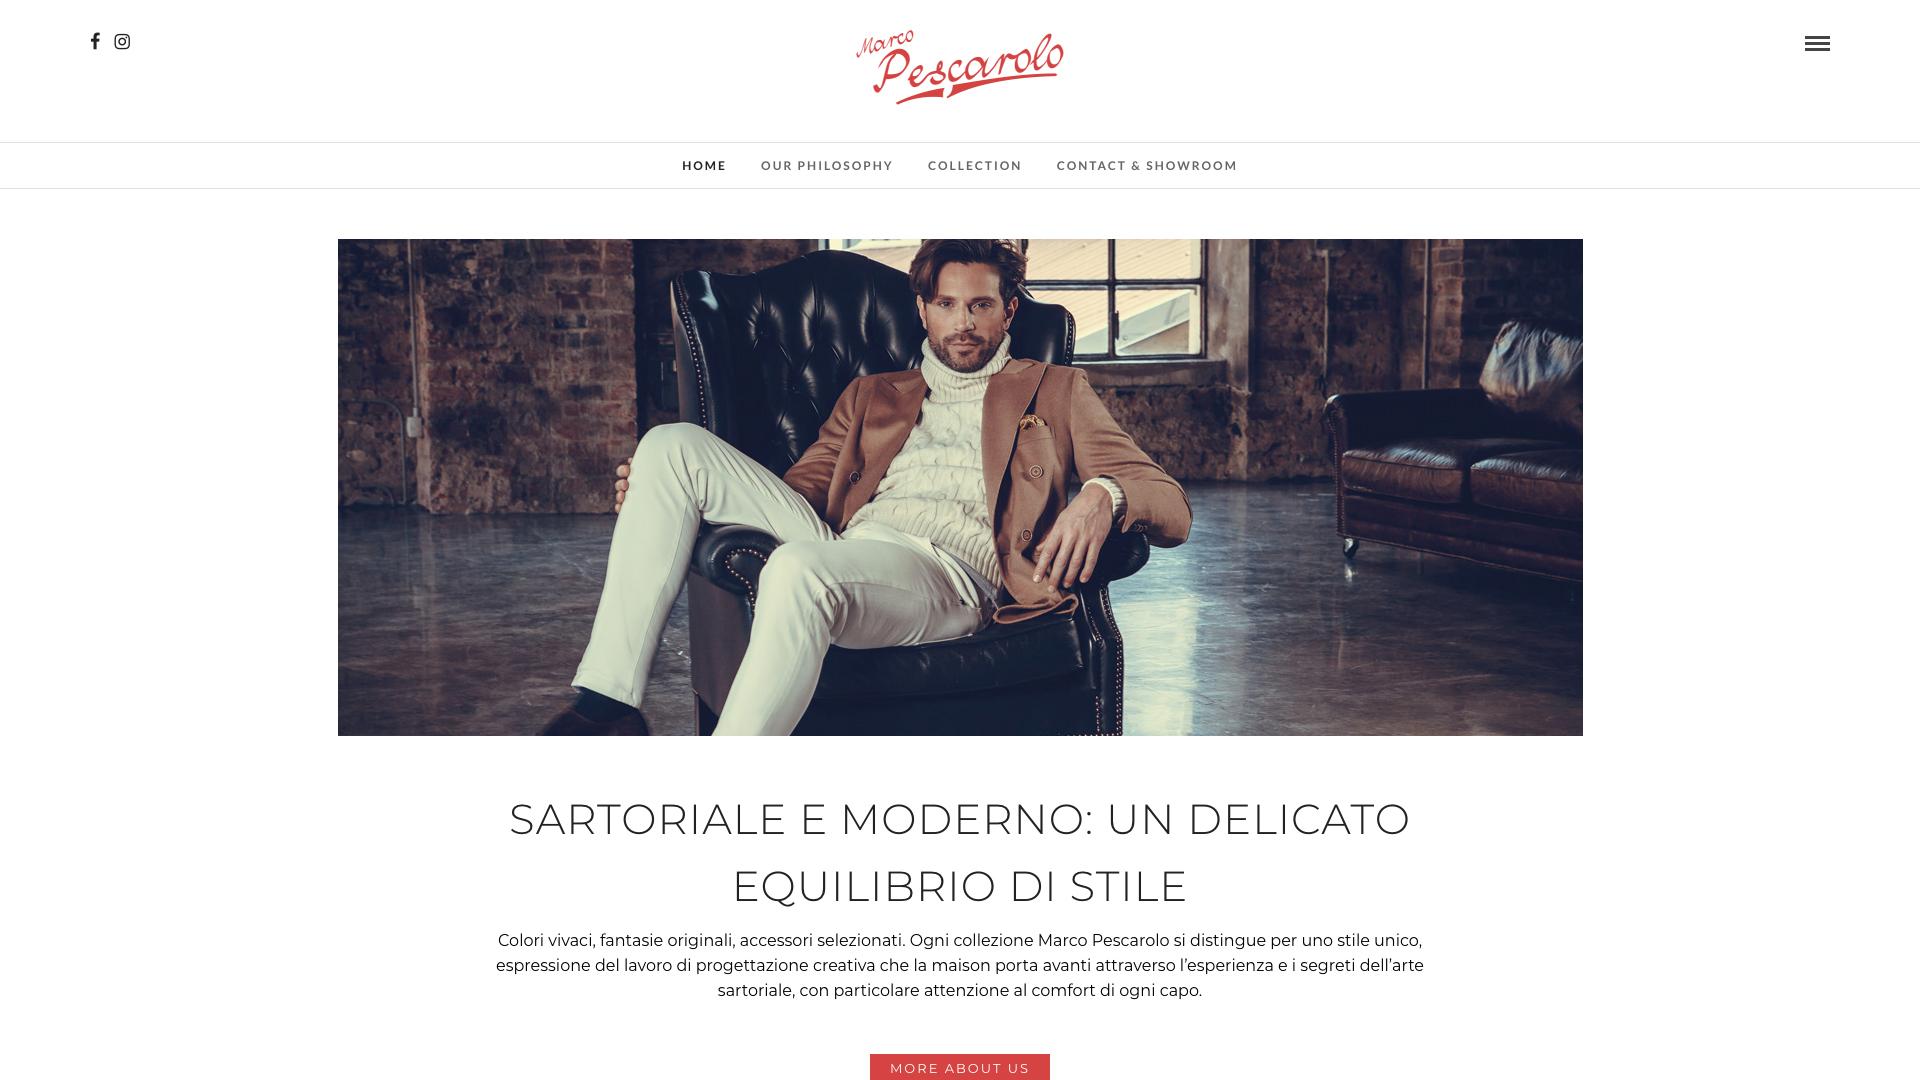 agnzia-comunicazione-napoli-roberto-guariglia-advertising-portfolio-work-fashion-marco-pescarolo-napoli-kiton-sartorio-pantaloni-sartoria-sito-web-1.jpg